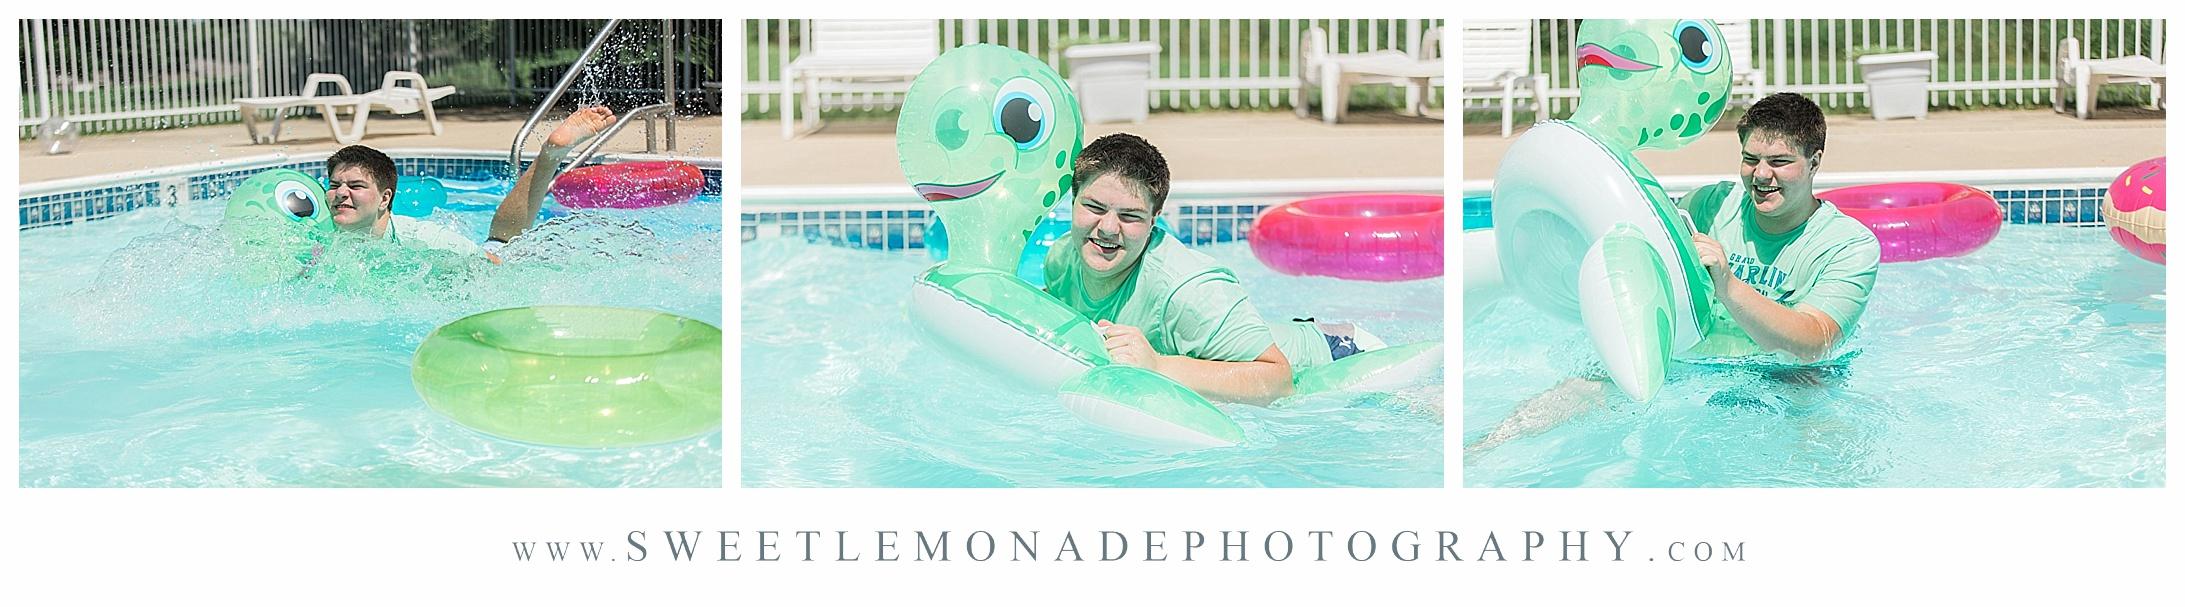 champaign-senior-photographer-sweet-lemonade-photography-senior-pictures-pool_2149.jpg